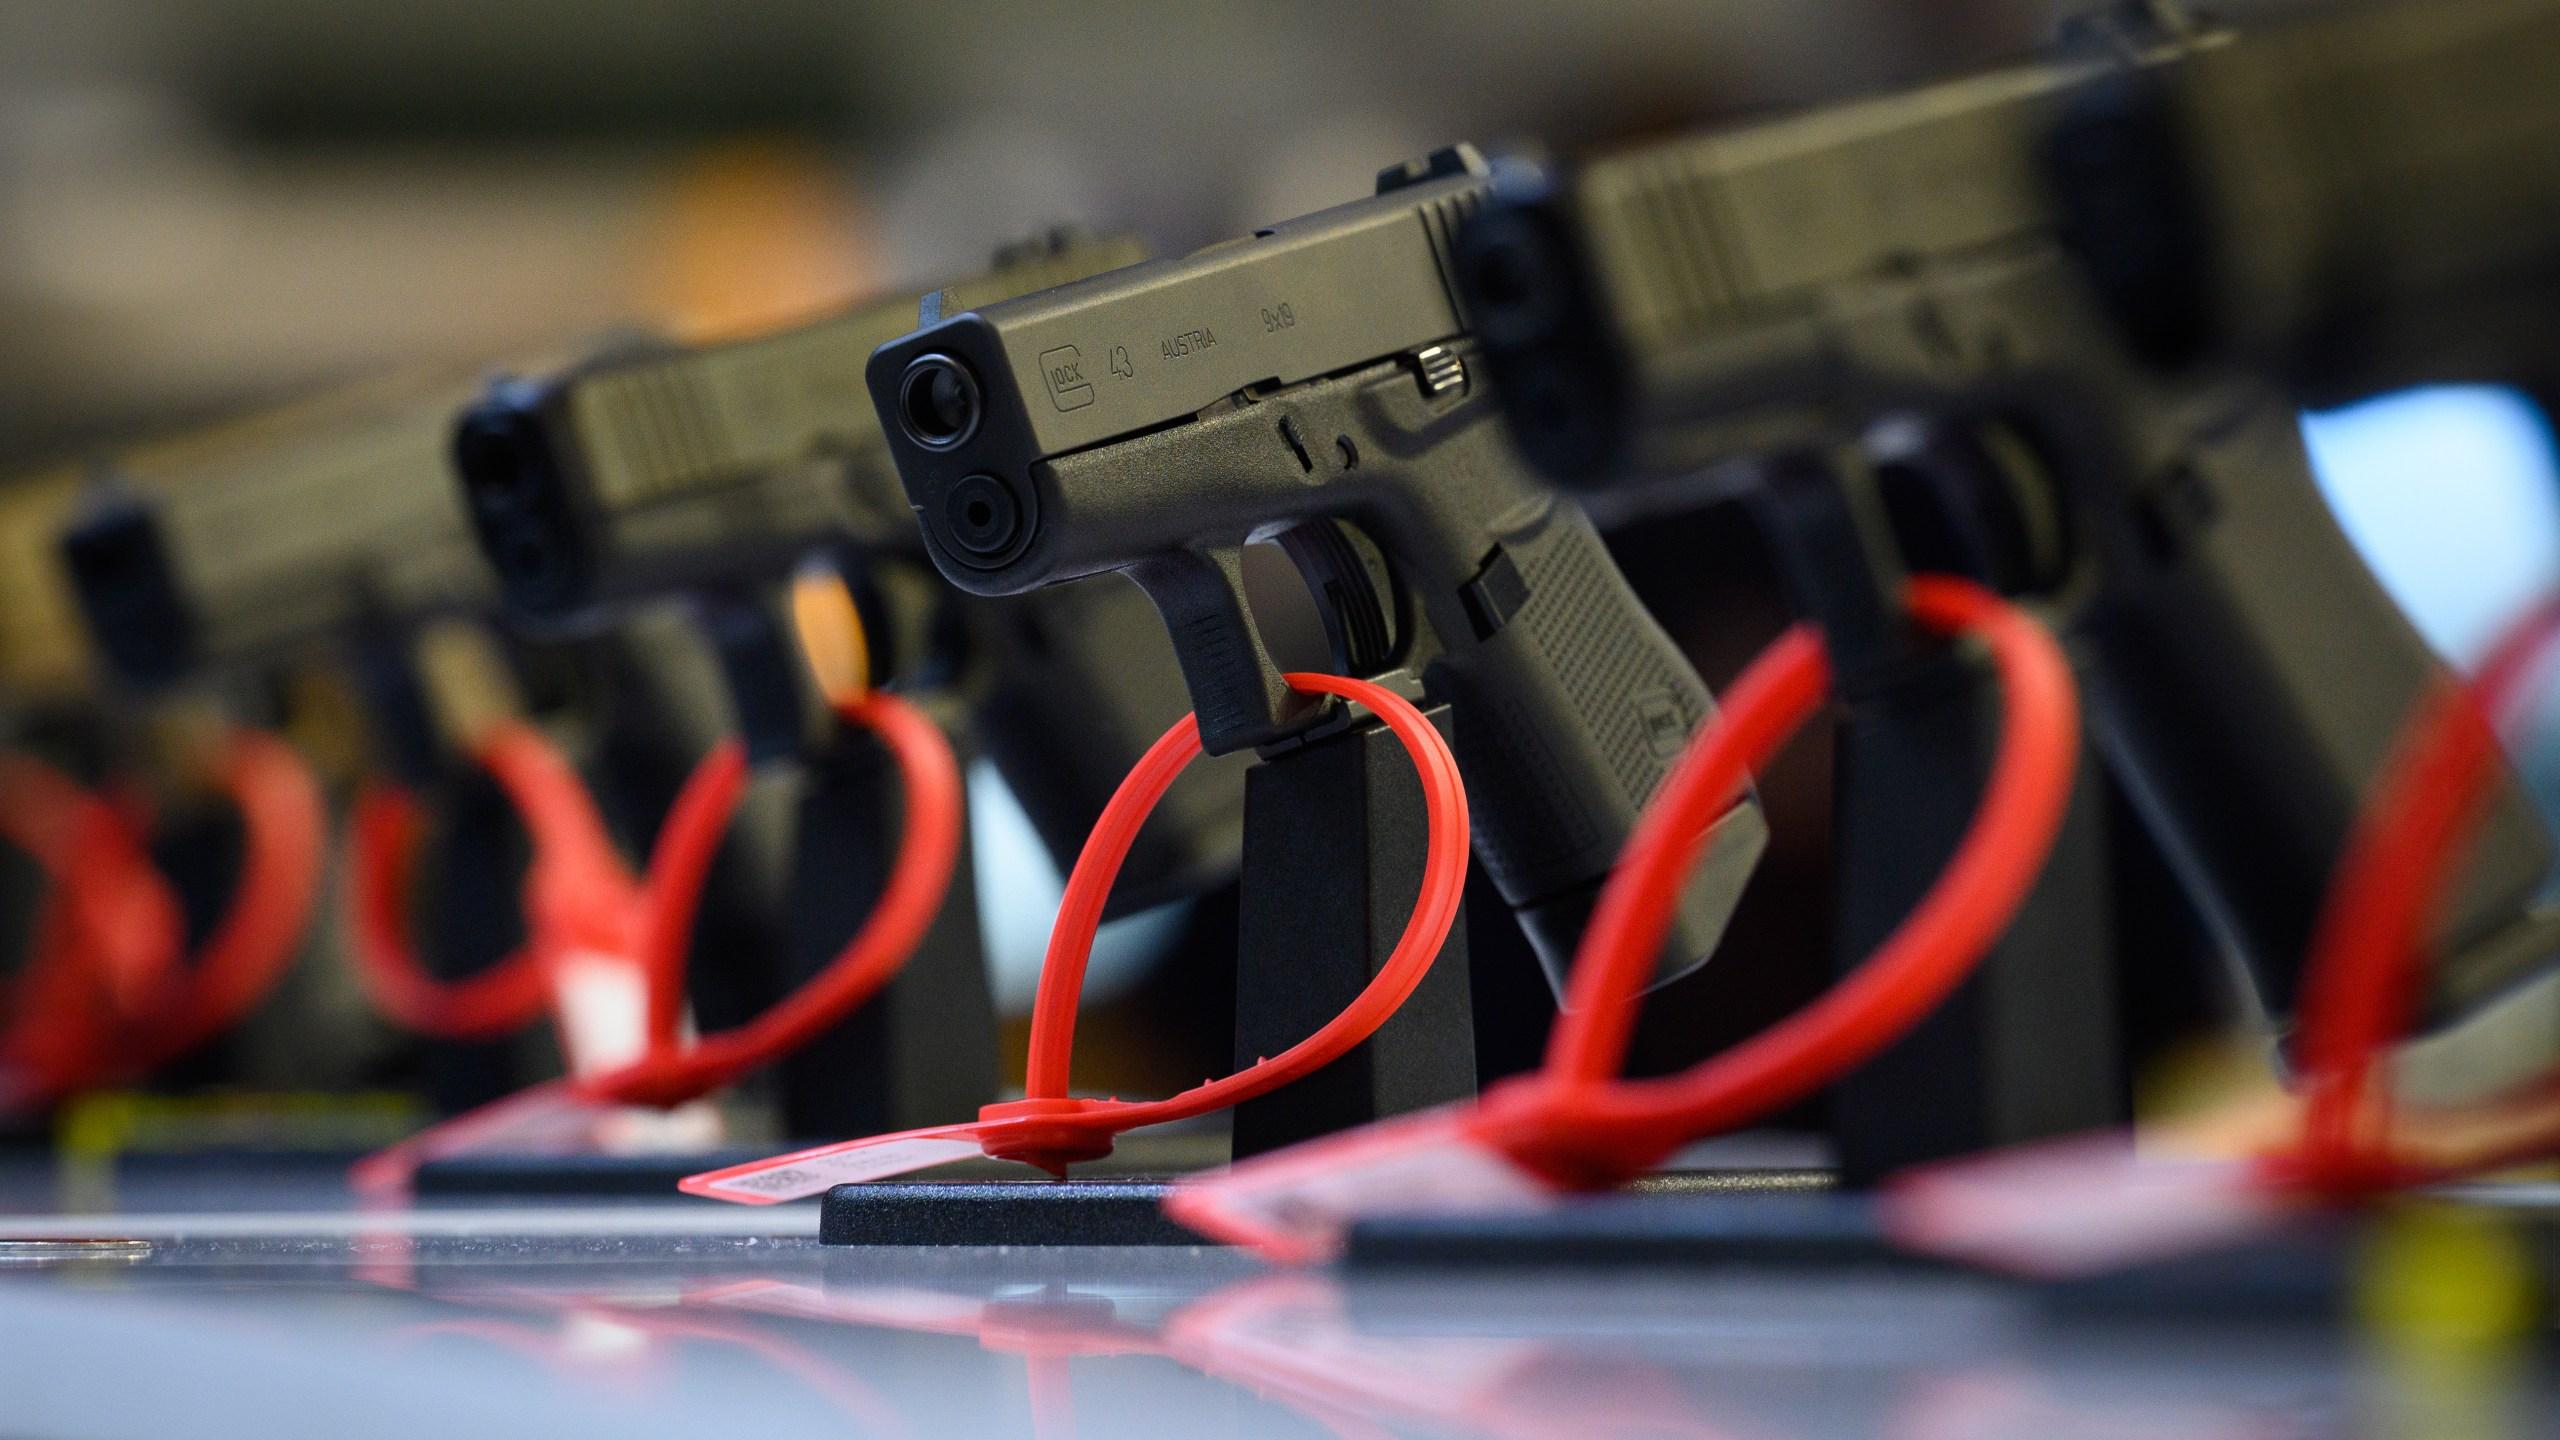 Chemung County Pistol Permit